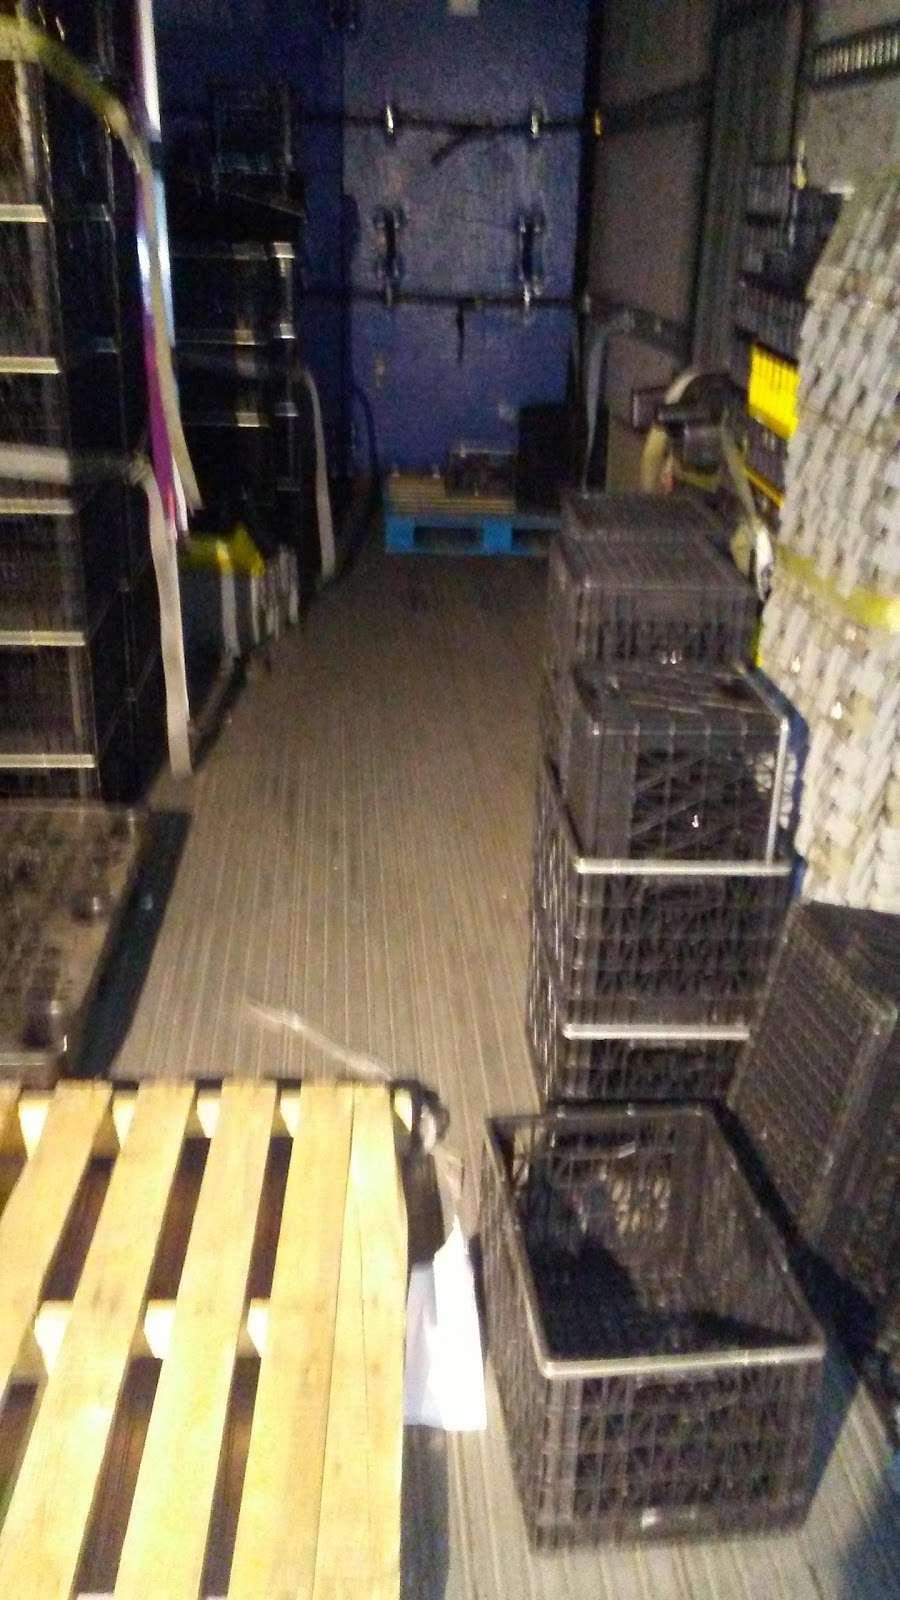 QCD Rocky Mountain LLC - storage  | Photo 2 of 10 | Address: 19754 E 35th Dr, Aurora, CO 80011, USA | Phone: (303) 552-3615